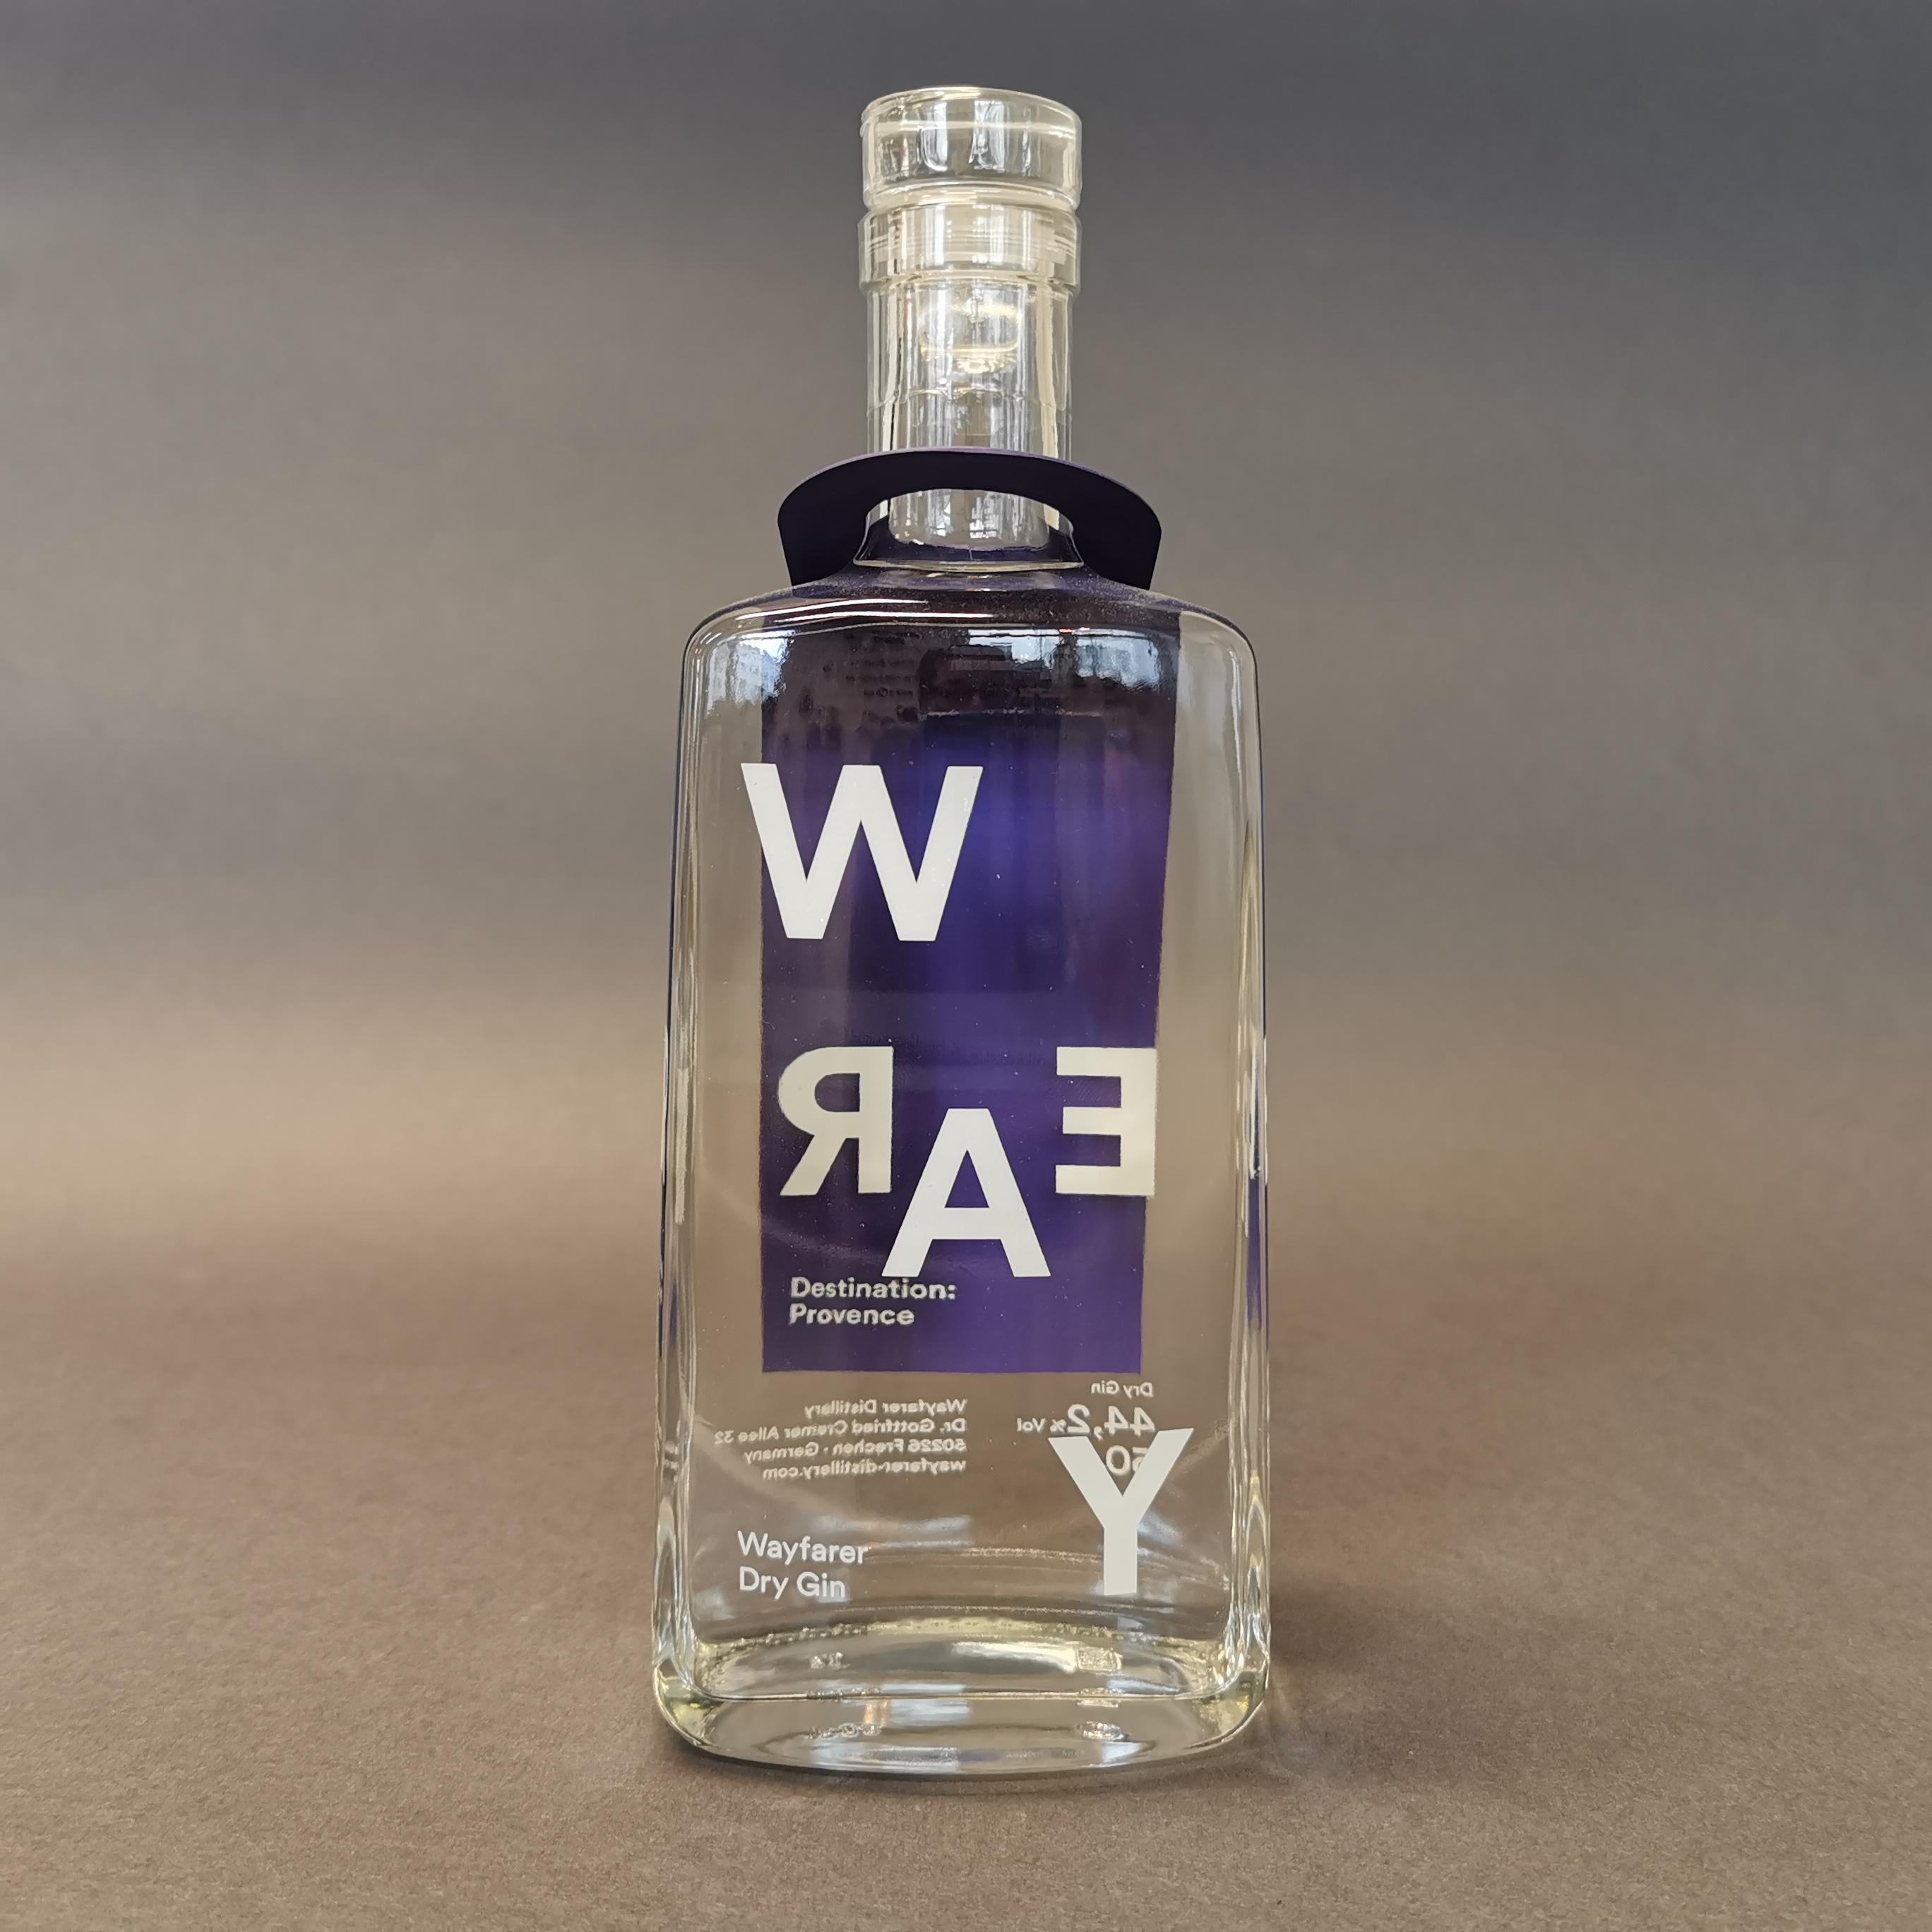 Wayfarer Dry Gin